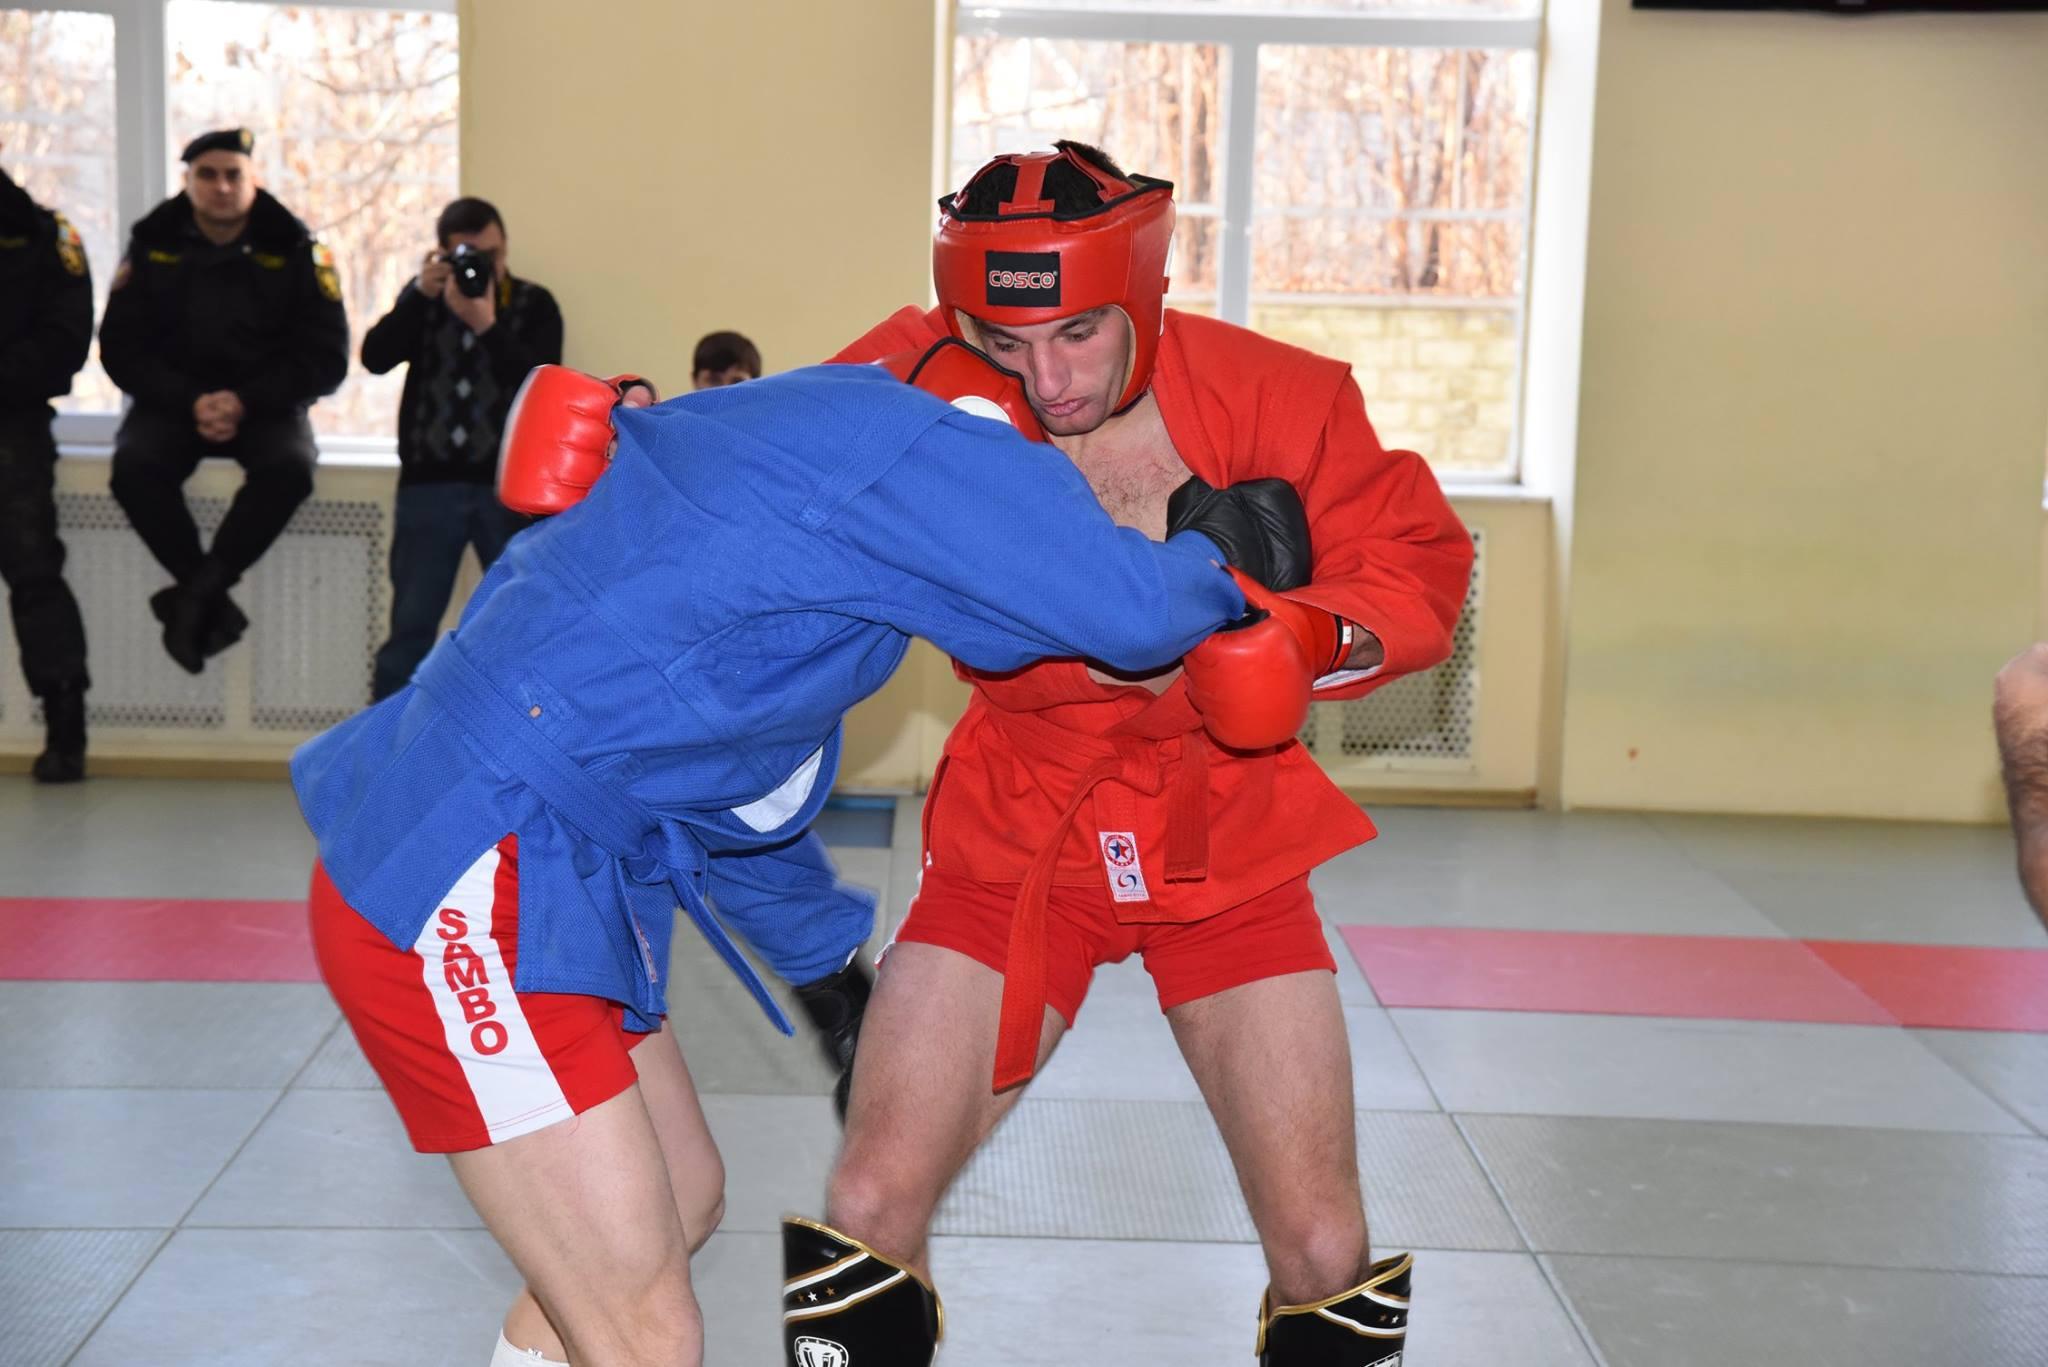 Lupta corp la corp din cadrul Spartachiadei CSC Dinamo 201841